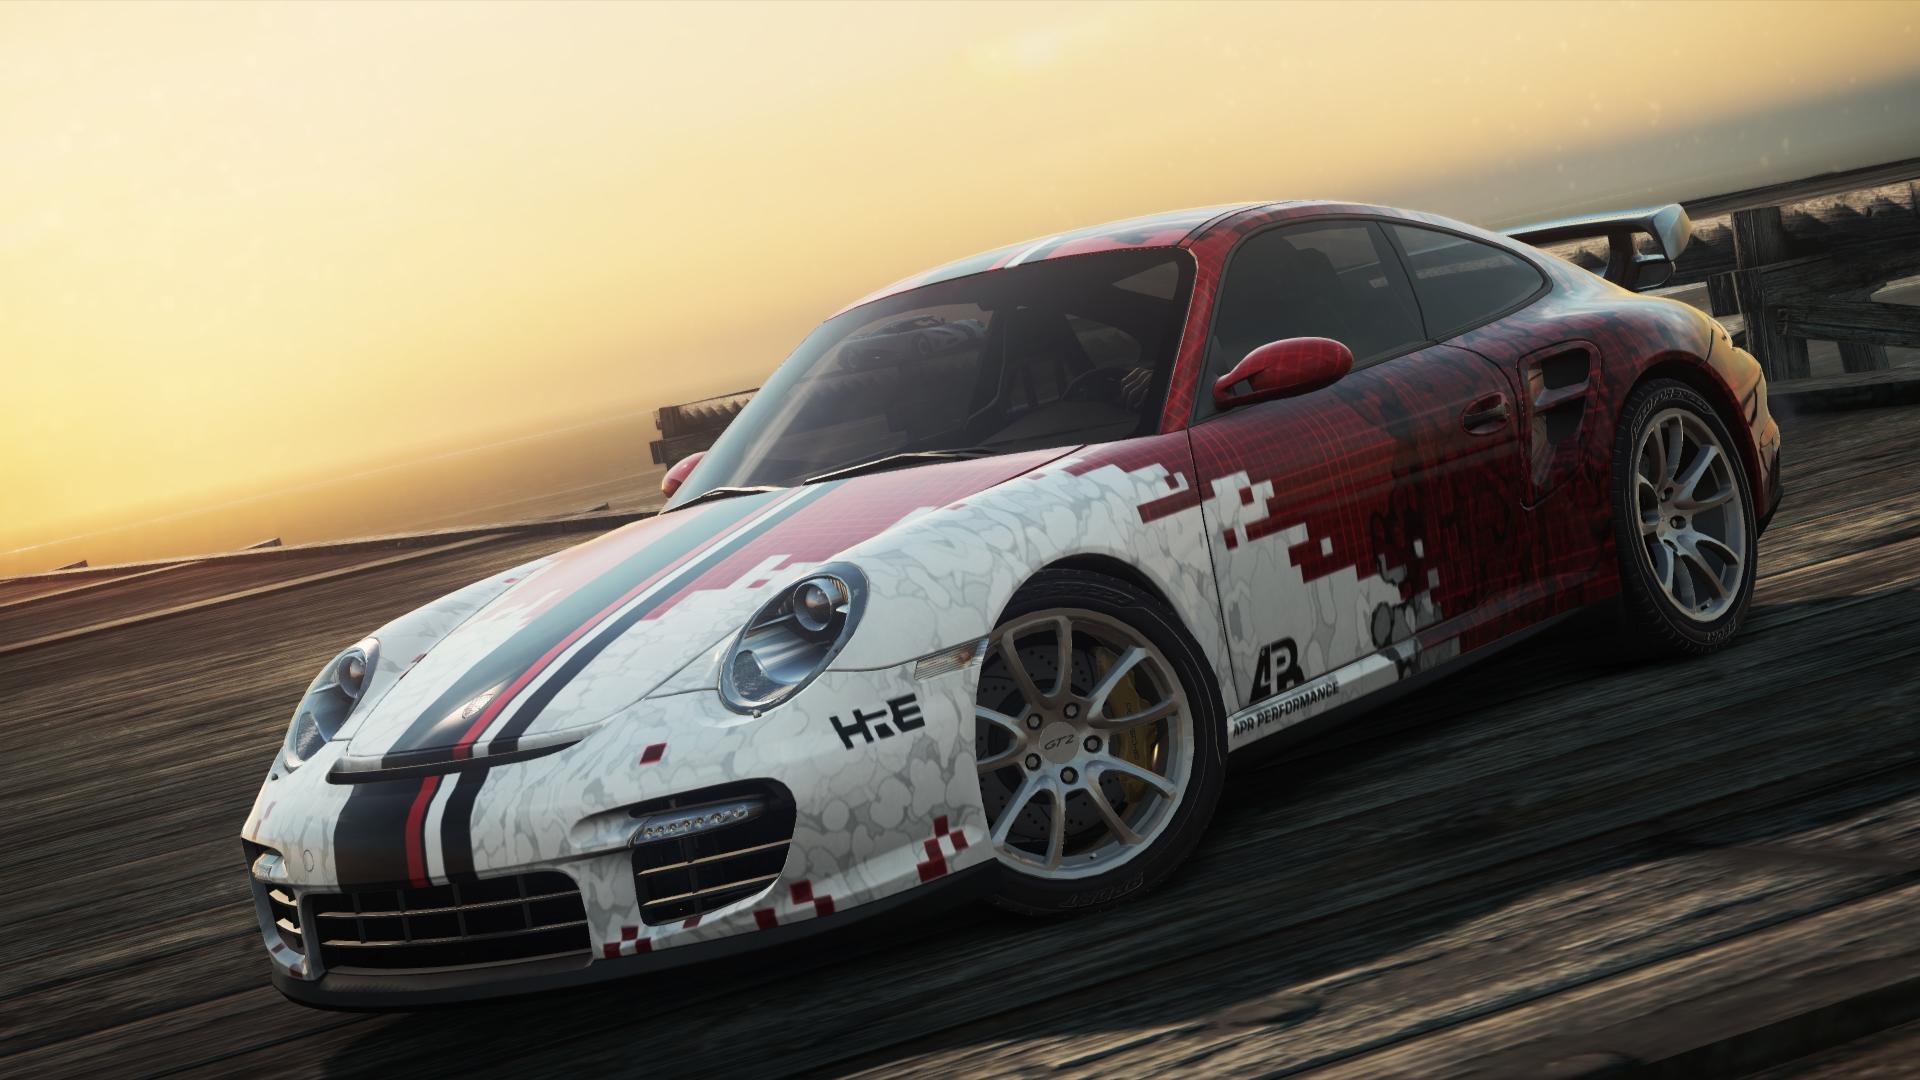 Porsche 911 GT2 (997) | Need for Speed Wiki | FANDOM powered by Wikia